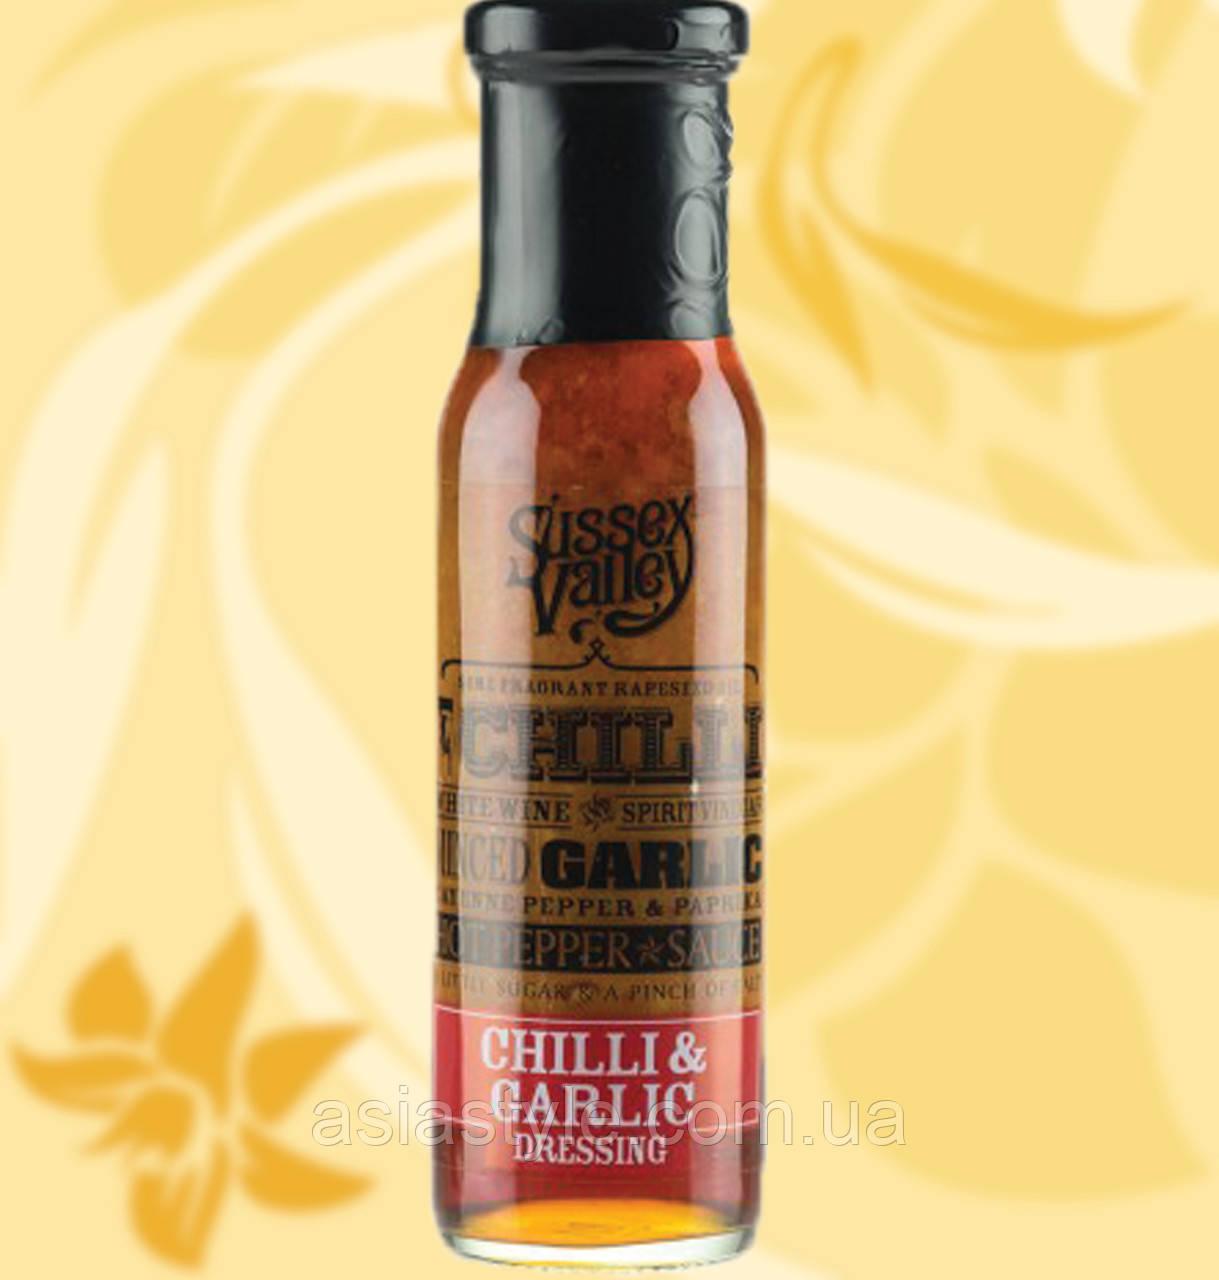 Соус Чилі з Часником, Sussex Valley Chili & Garlic Dressing, 240г, Ст